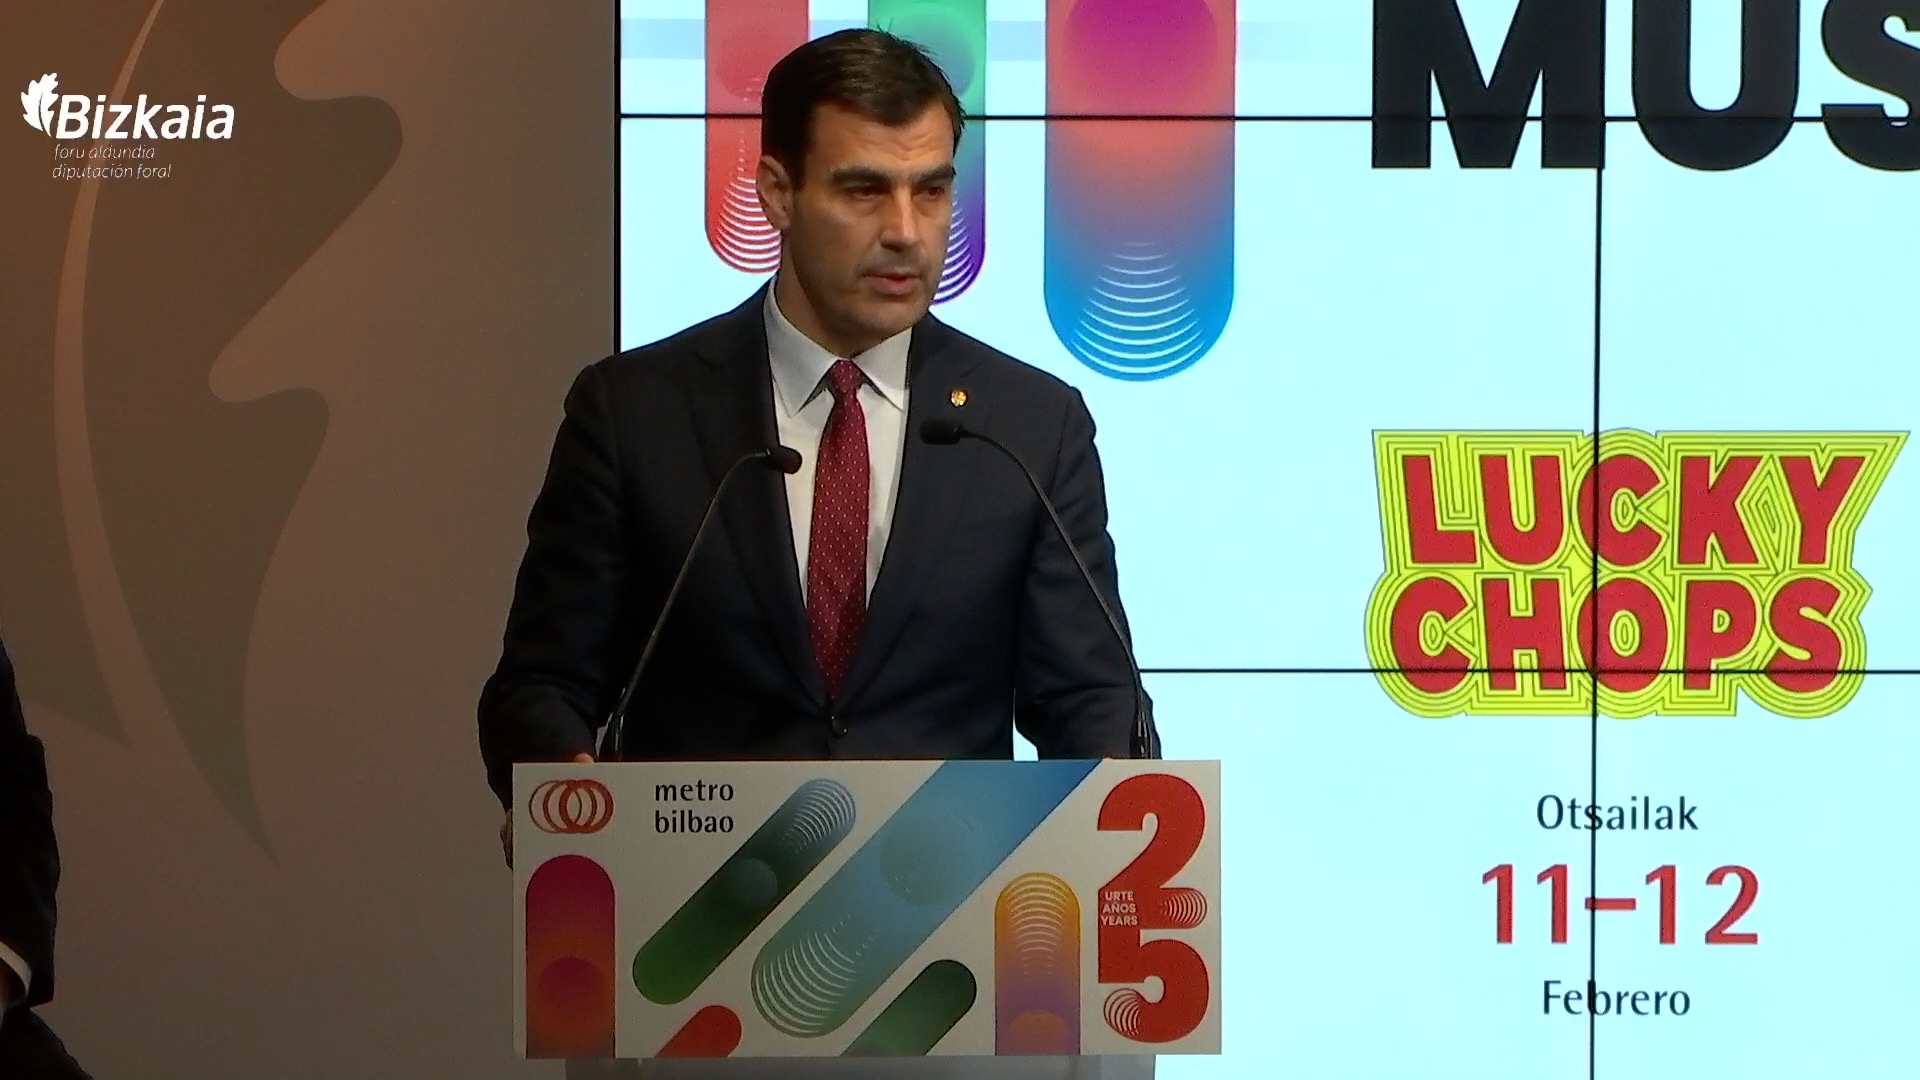 Miguel Ángel Gómez Viar